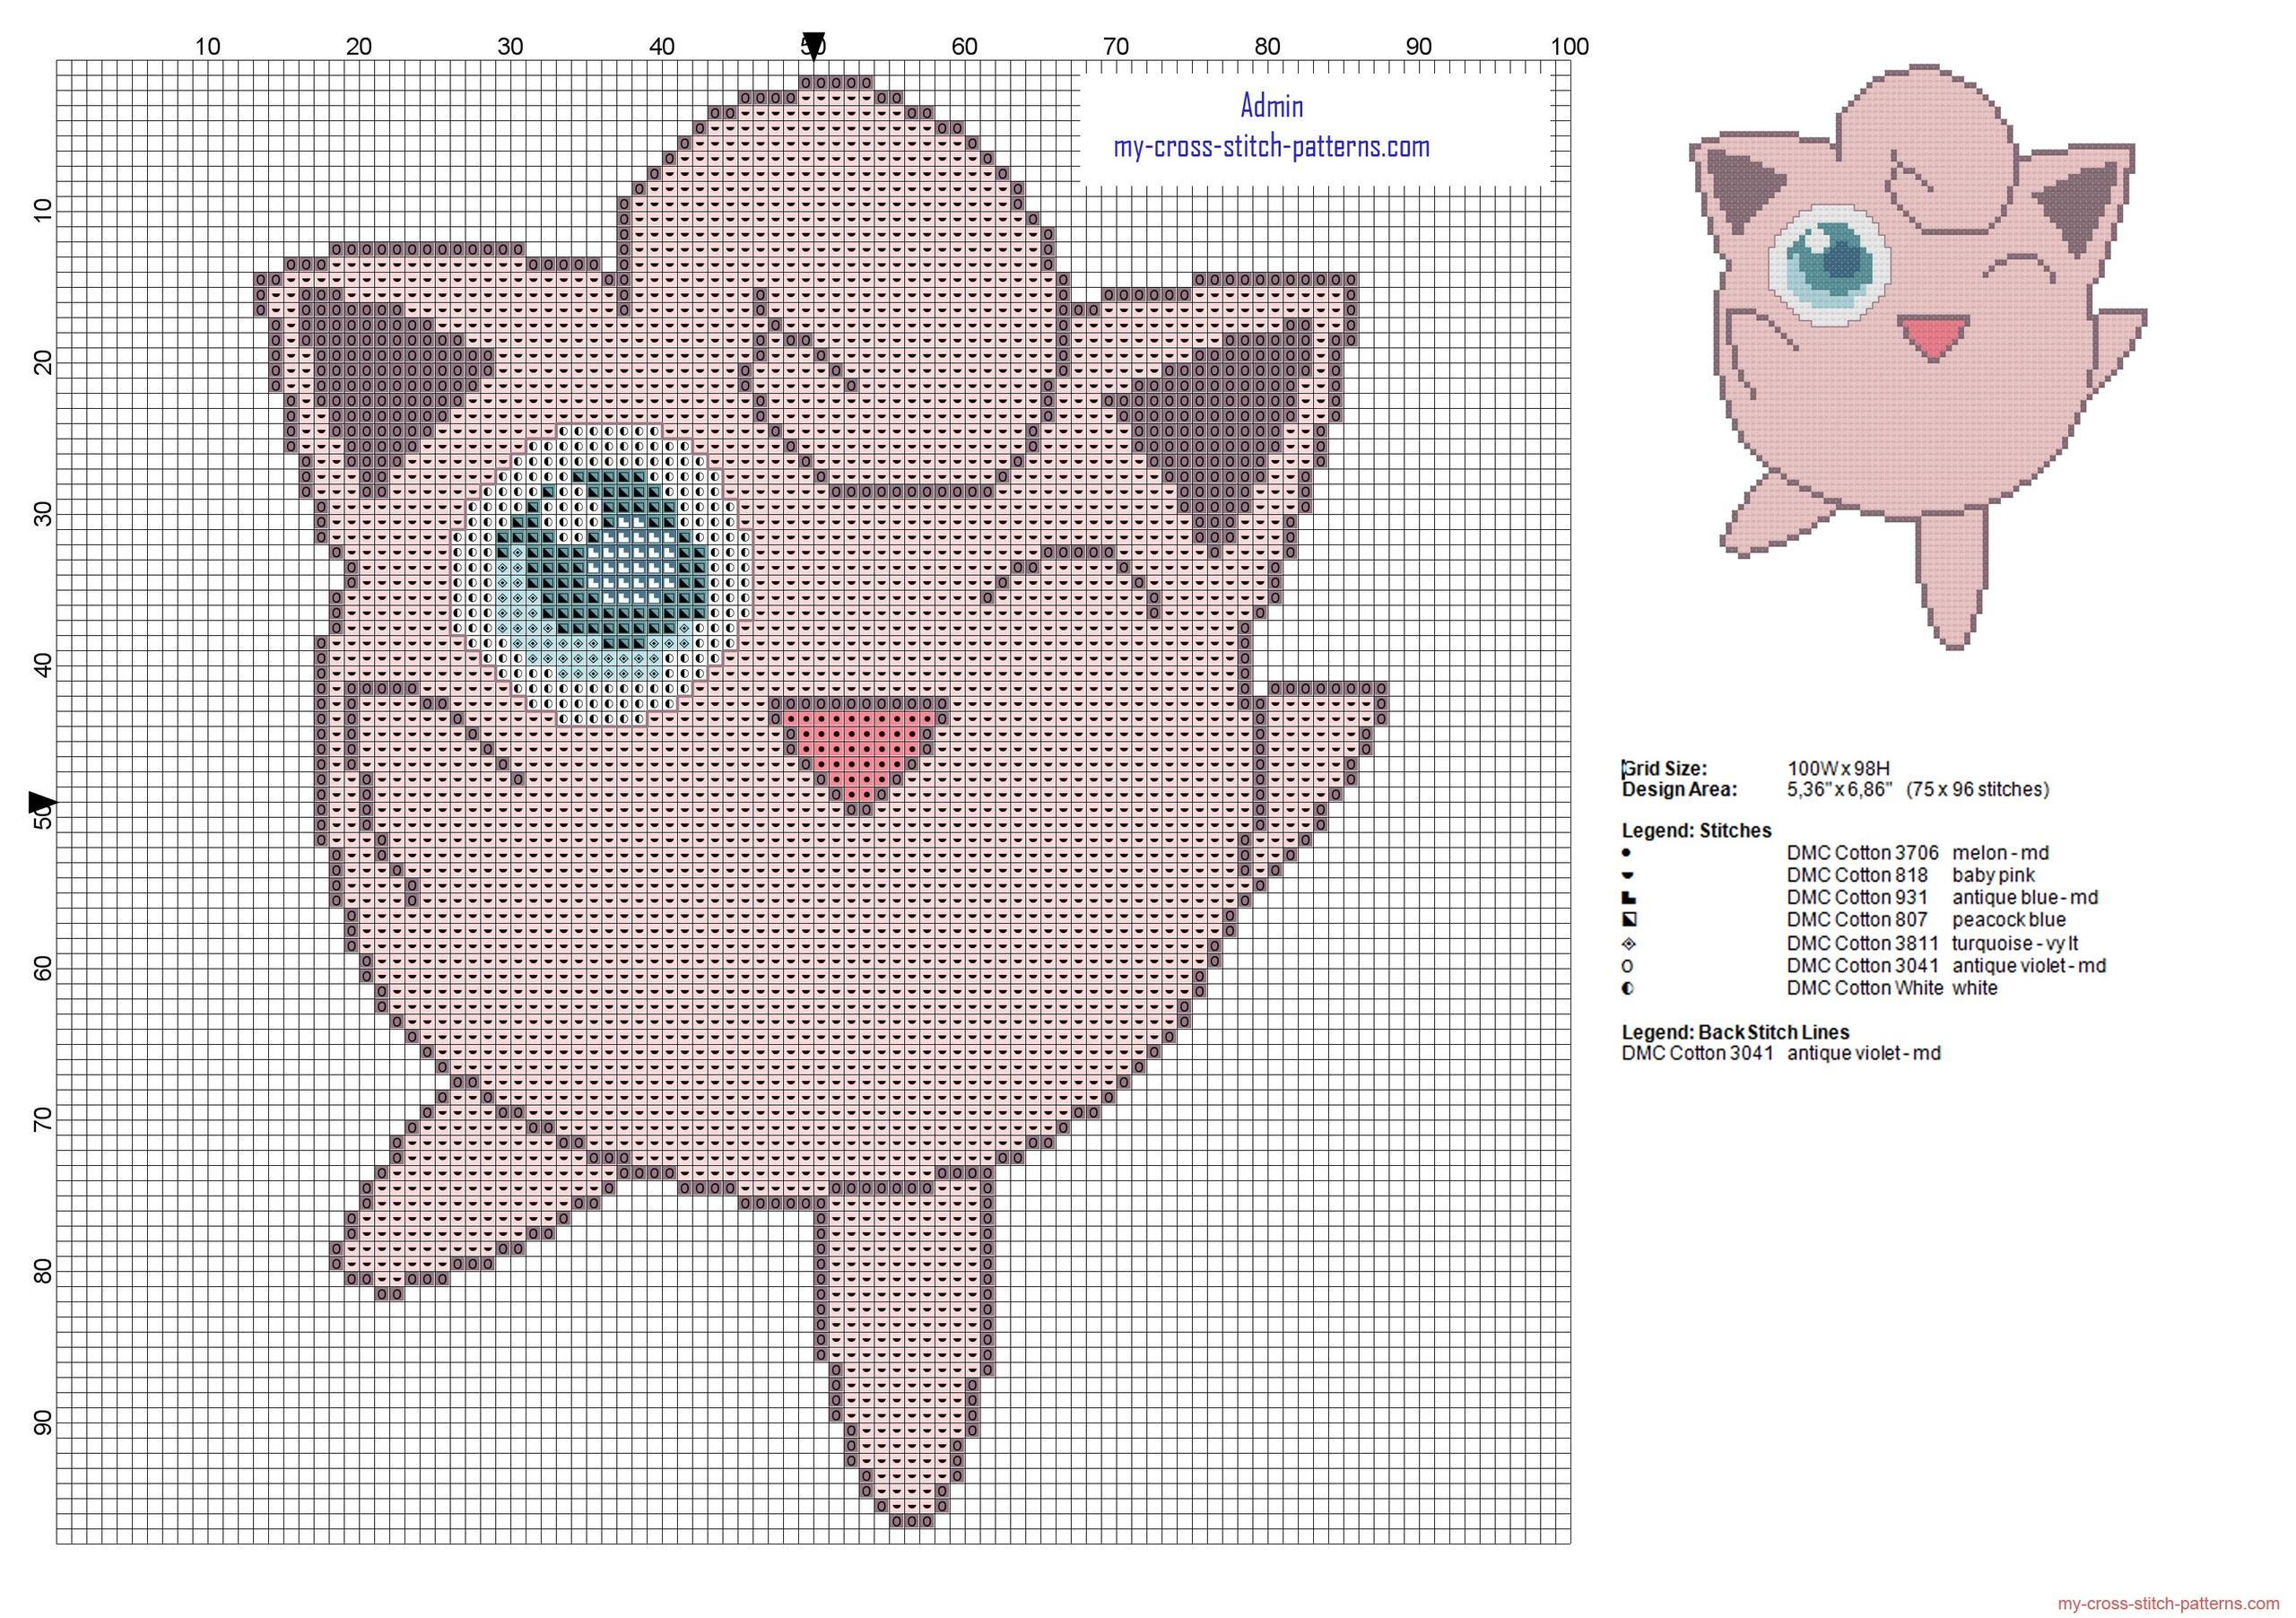 jigglypuff_pokemon_first_generation_number_039_cross_stitch_pattern